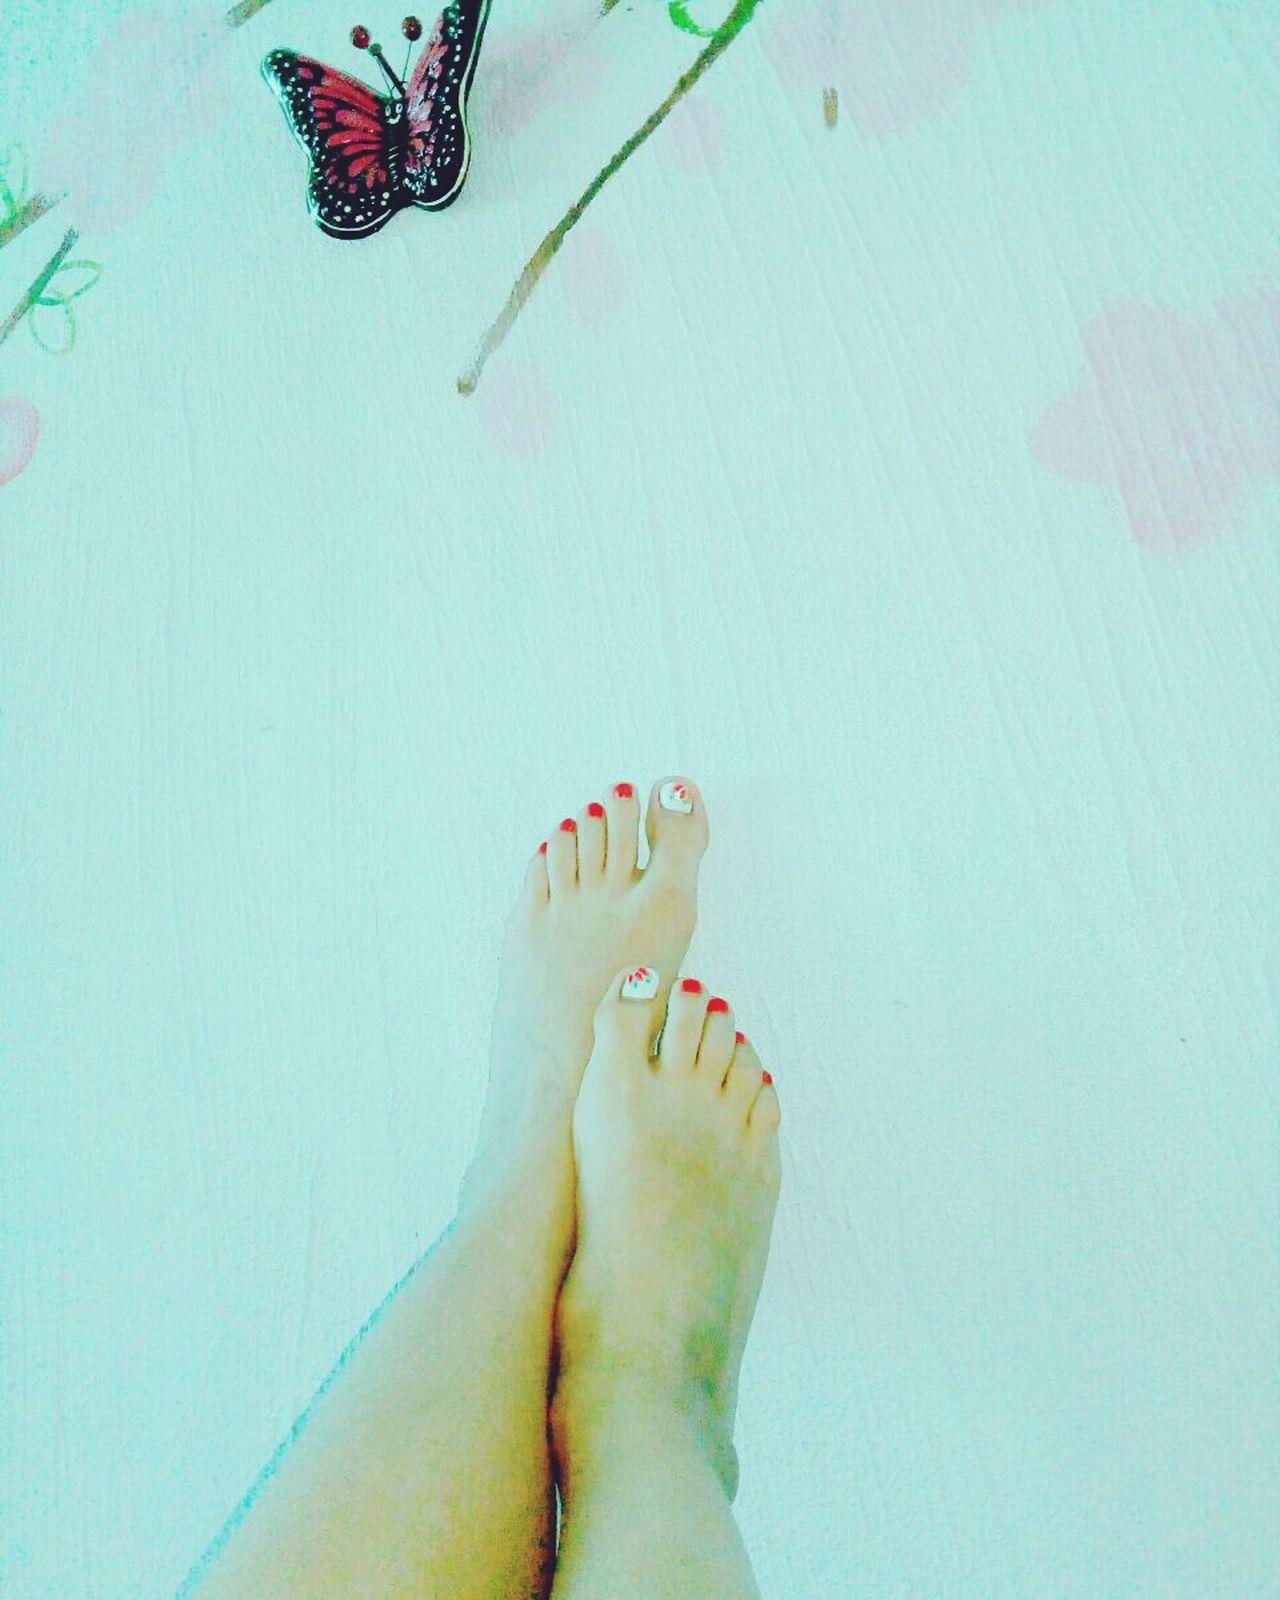 Loveyou♥ Gords Mariposas Feetlove Feets Relaxing One Woman Only Human Foot Nail Polish Human Body Part Women Relaxation Toenail